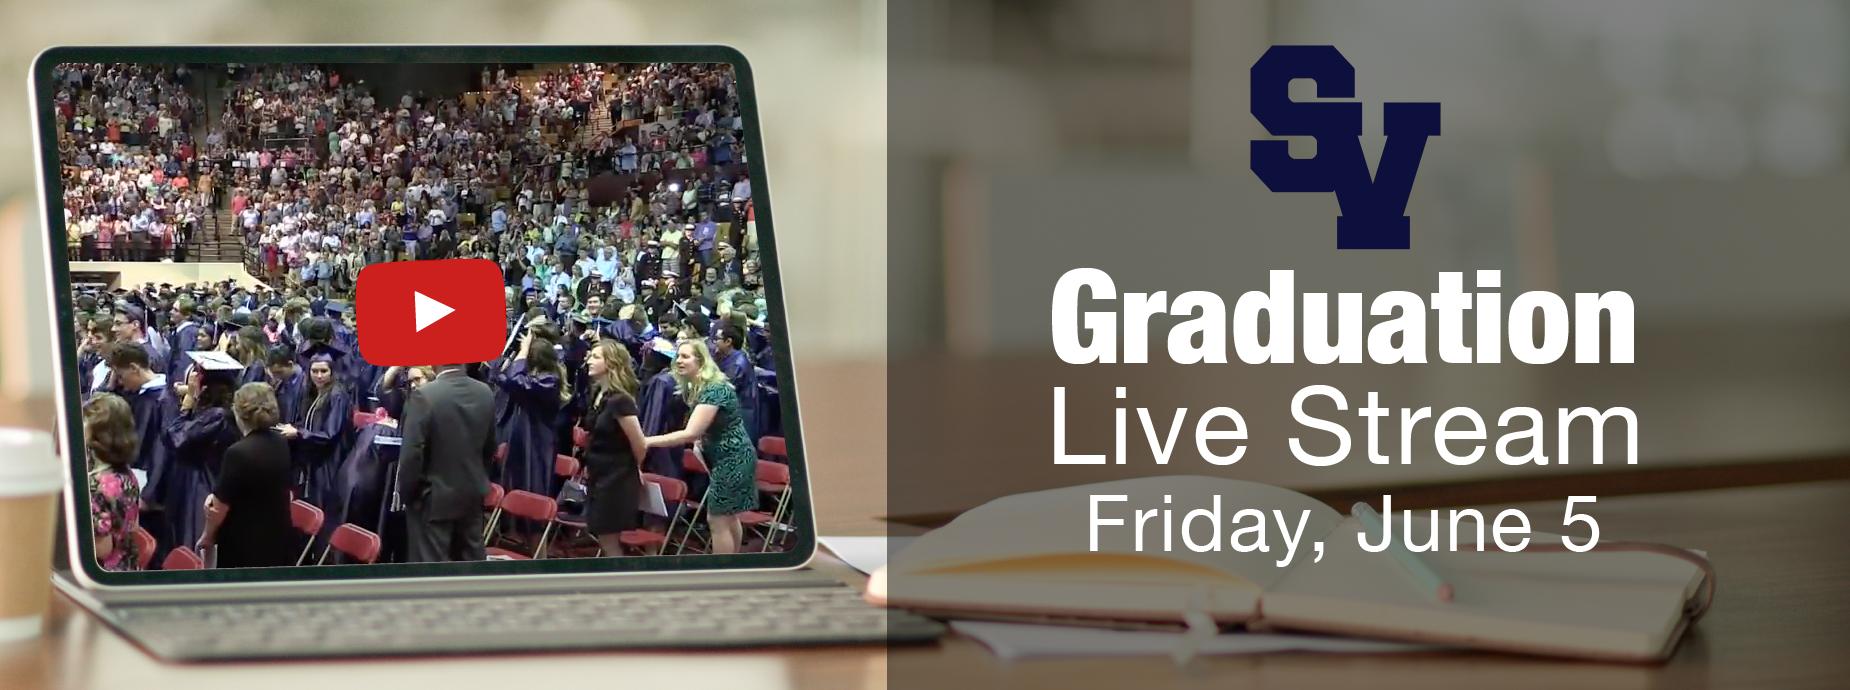 Live Stream Graduation Banner